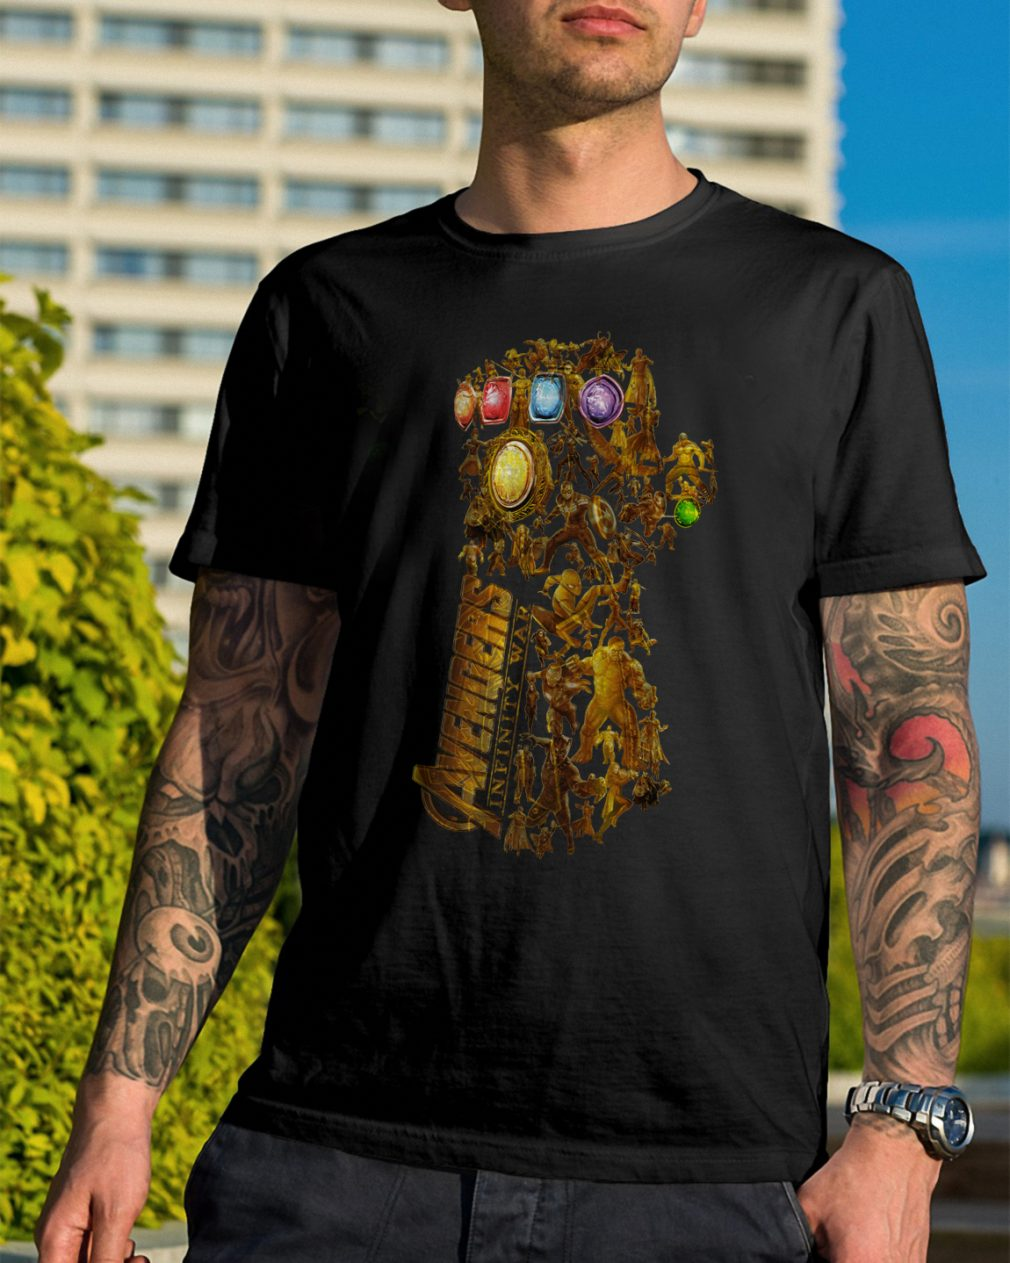 Hero Marvel Avengers Infinity Gauntlet Shirt